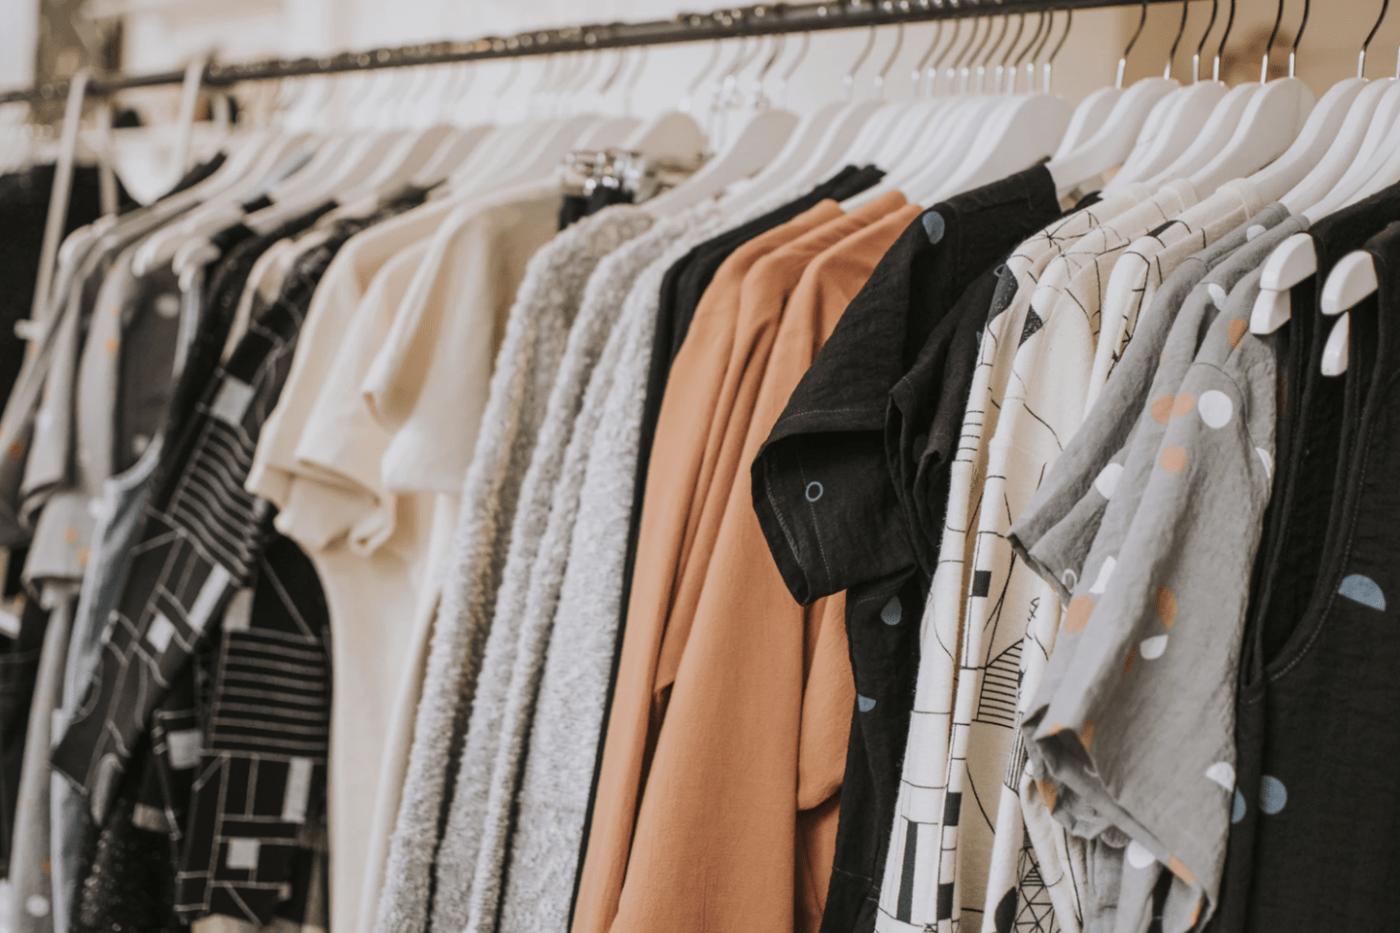 Rack of hanging clothing